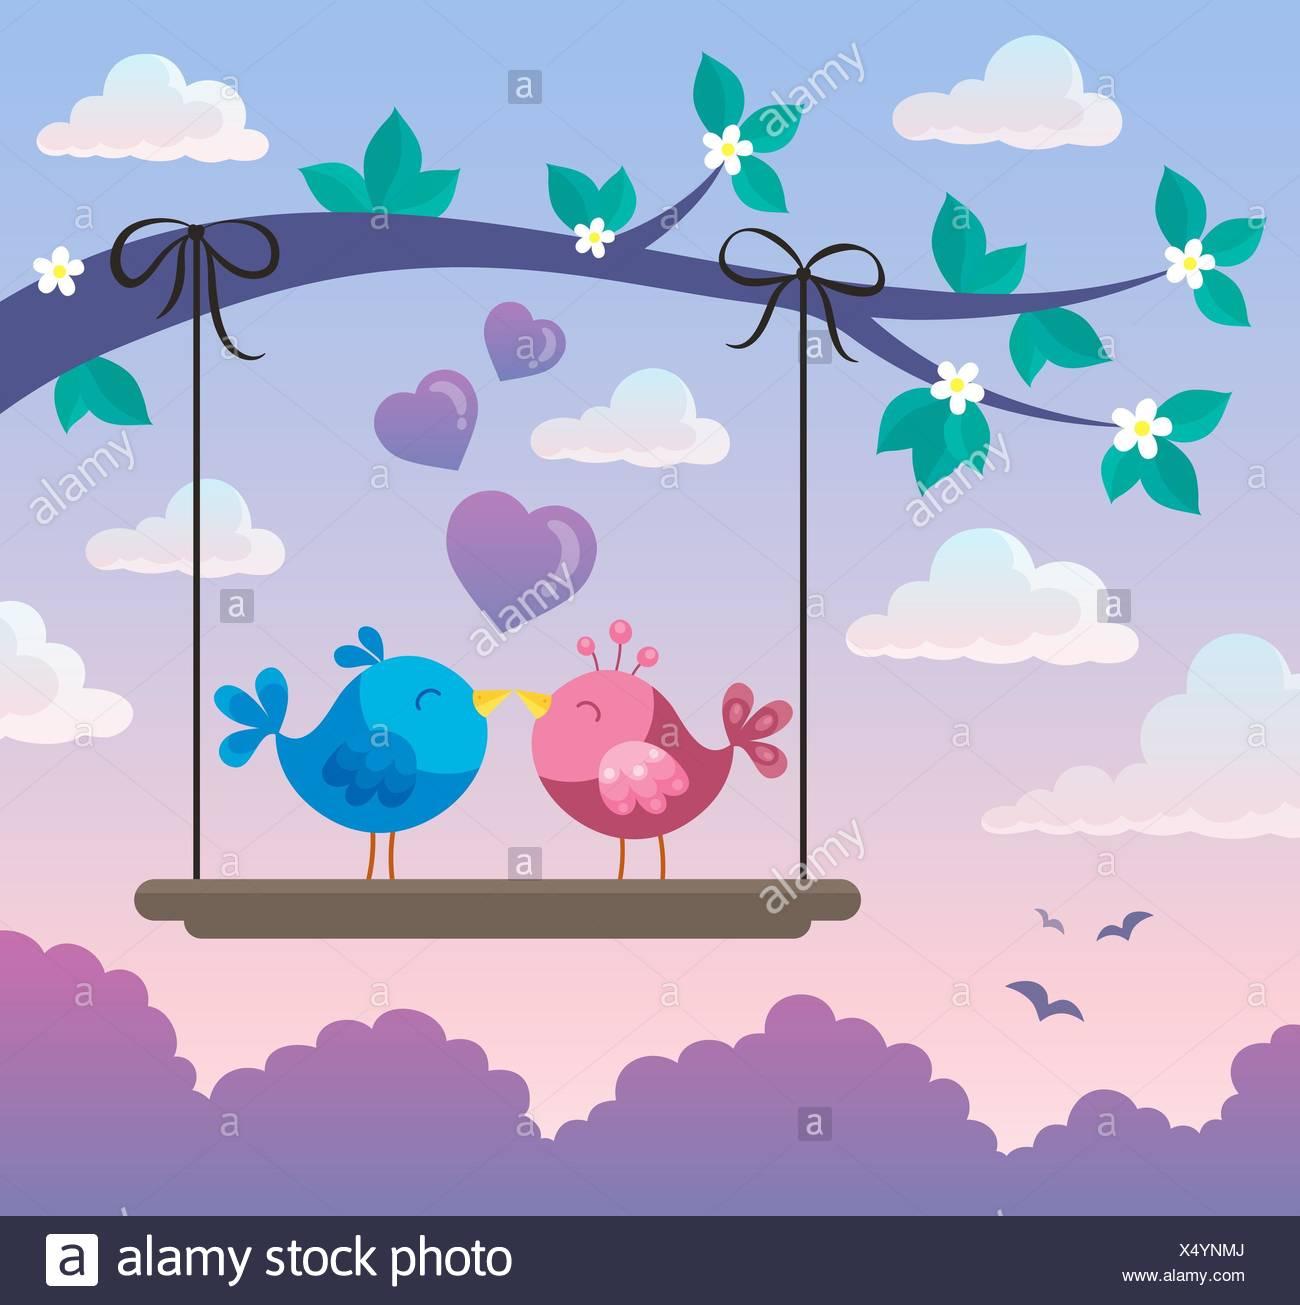 Valentine birds on board below branch 2 - Stock Image